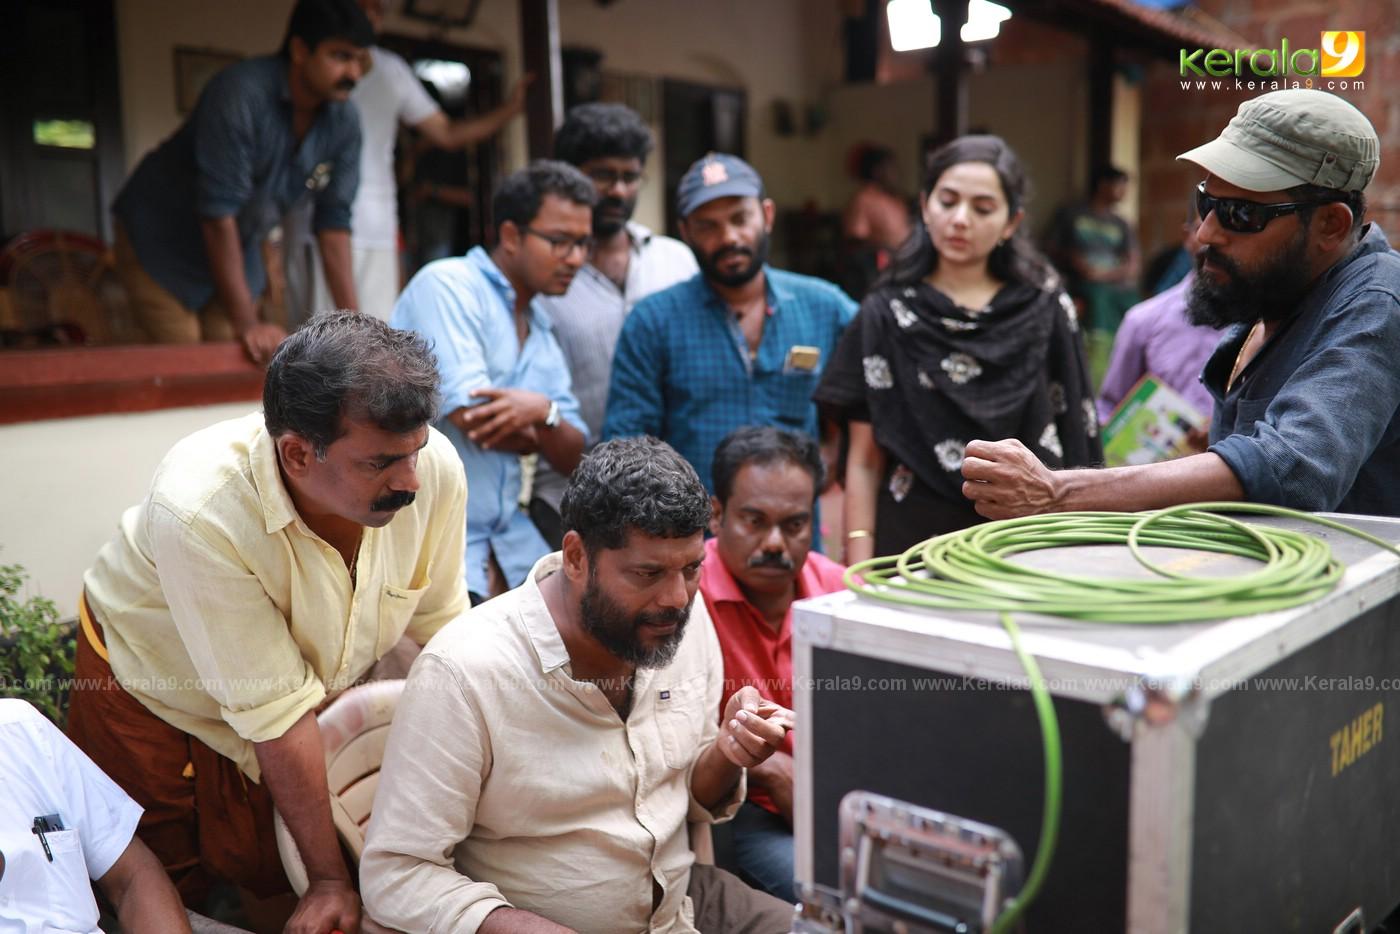 Sathyam Paranja Viswasikkuvo movie stills 6 - Kerala9.com